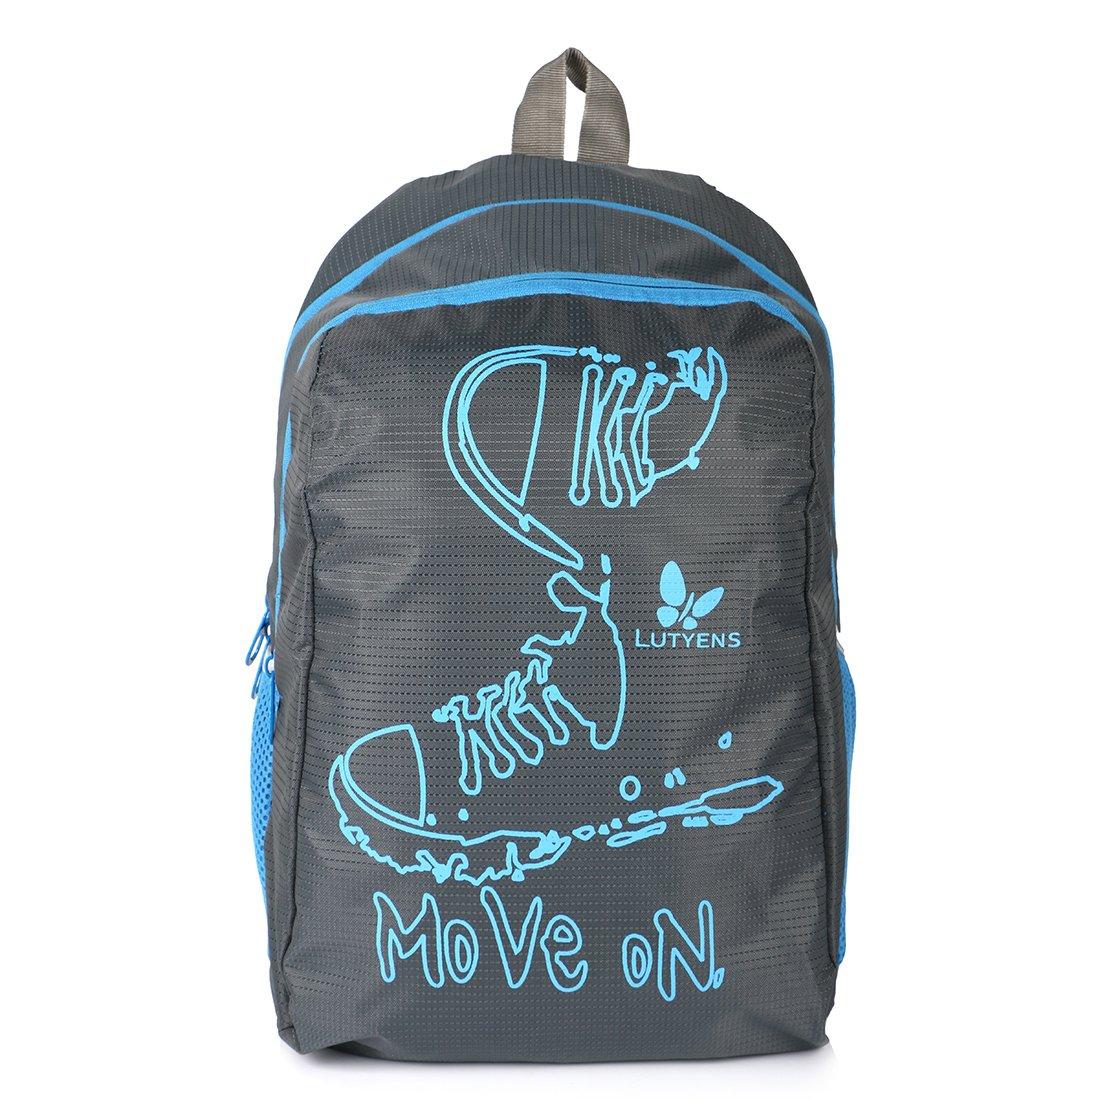 School bags online cash on delivery - Lutyens Polyester Black Blue School Bags 17 Liters Lutyens_194 Amazon In Bags Wallets Luggage